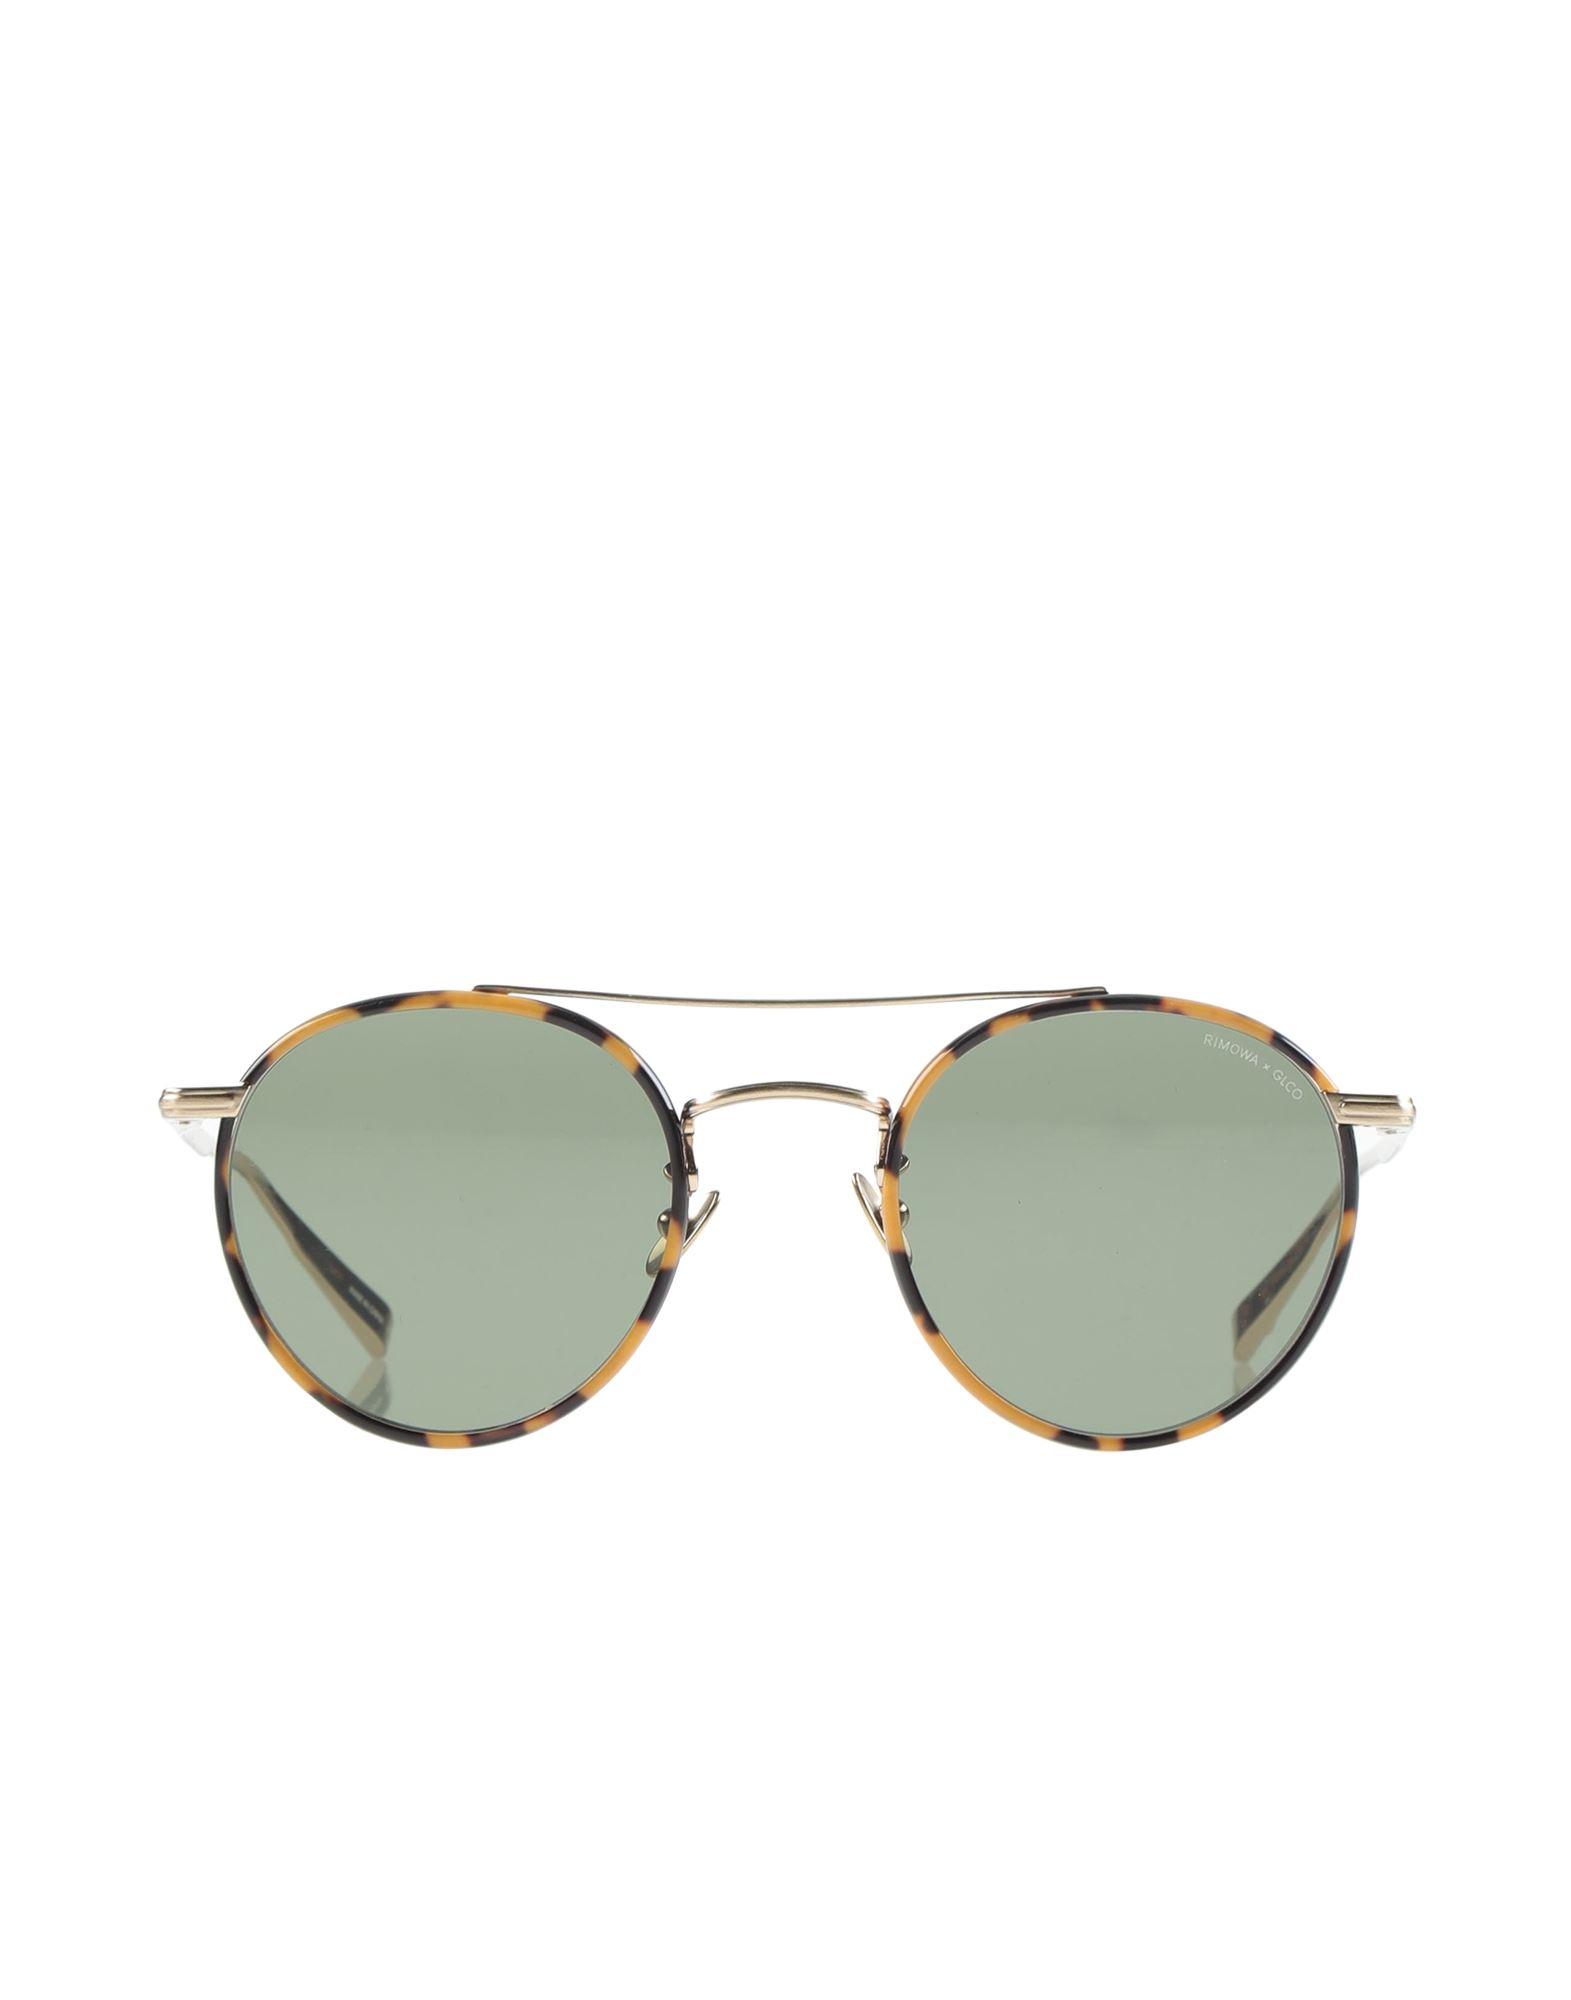 RIMOWA x GLCO Sunglasses - Item 46751171